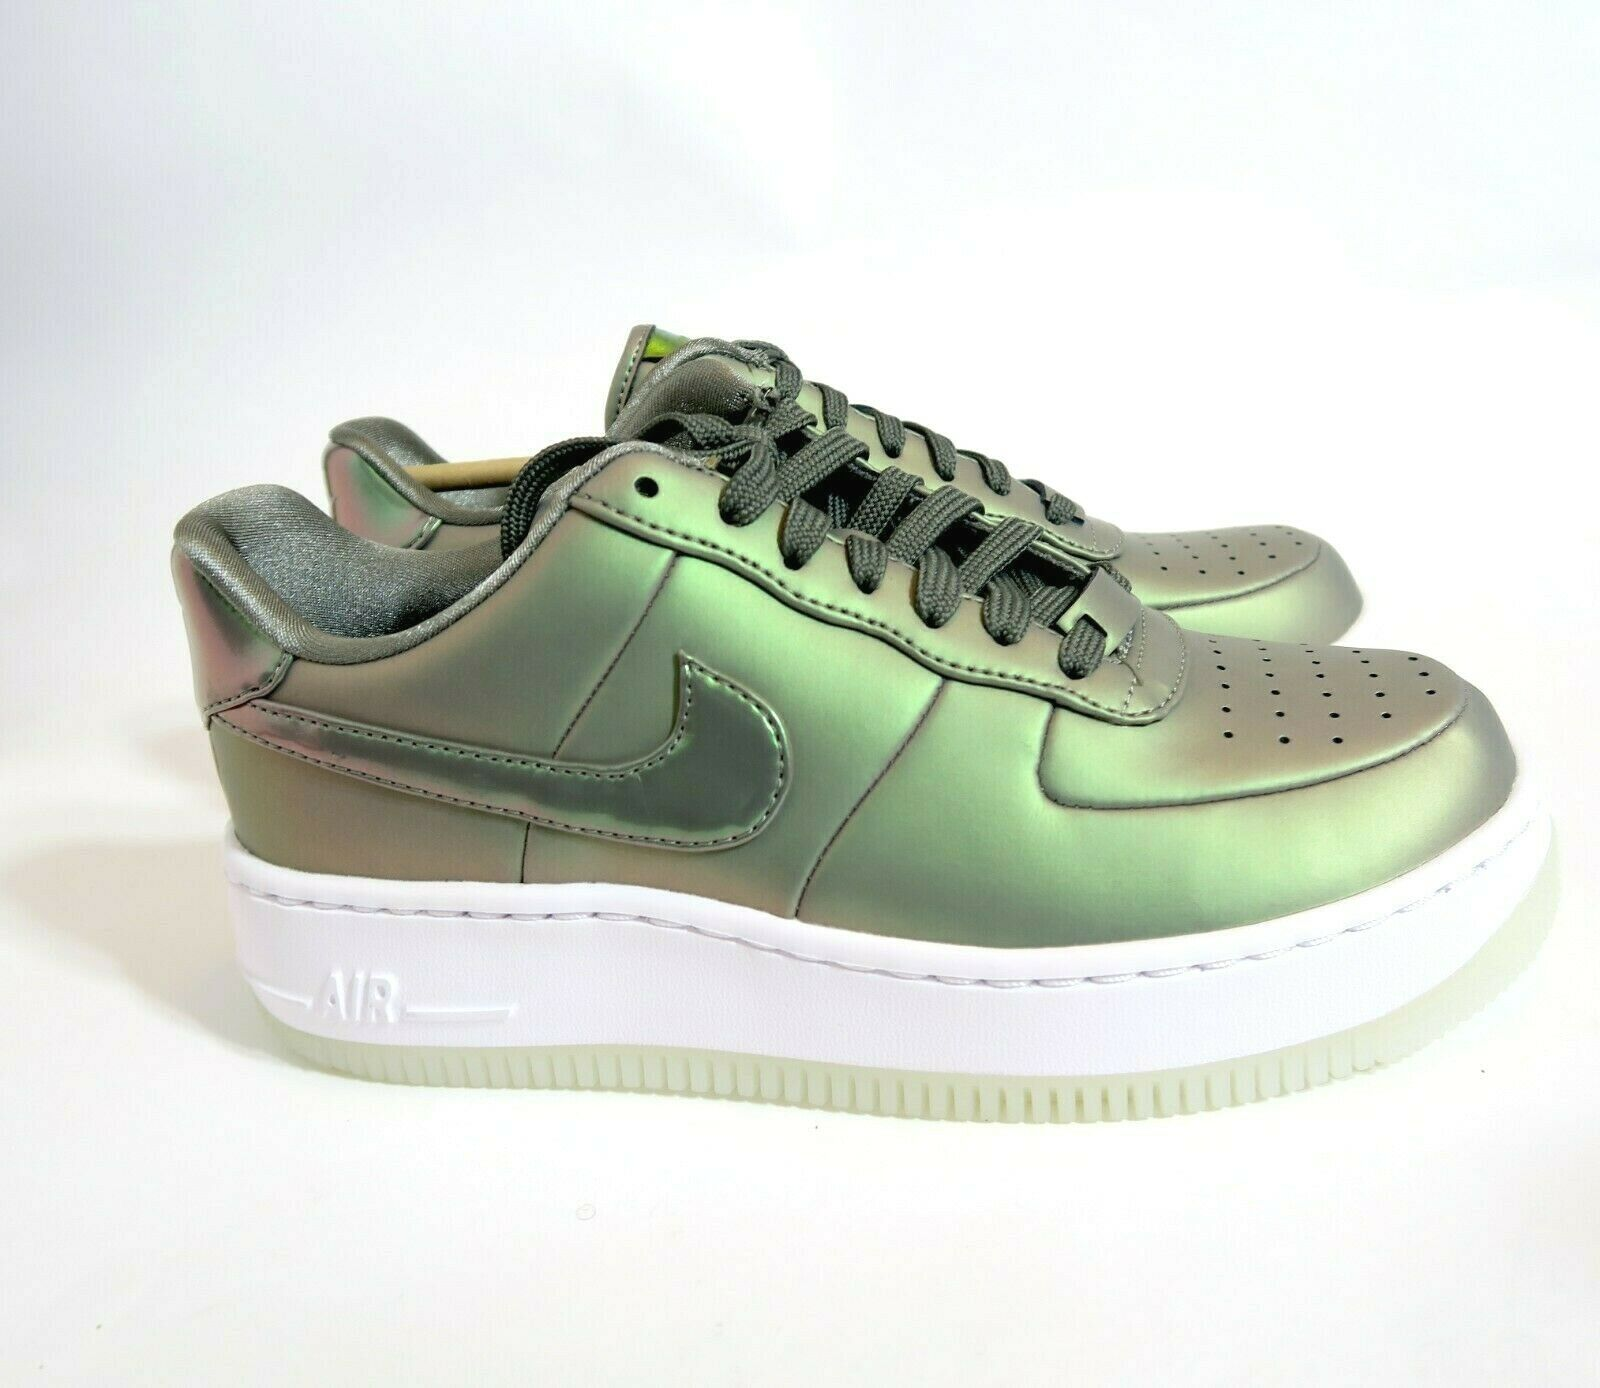 quality design 1346b 7c4cf Nike Wnms Wnms Wnms Air Force 1 Upstep PRM LX Dark Stucco Green AA3964-001